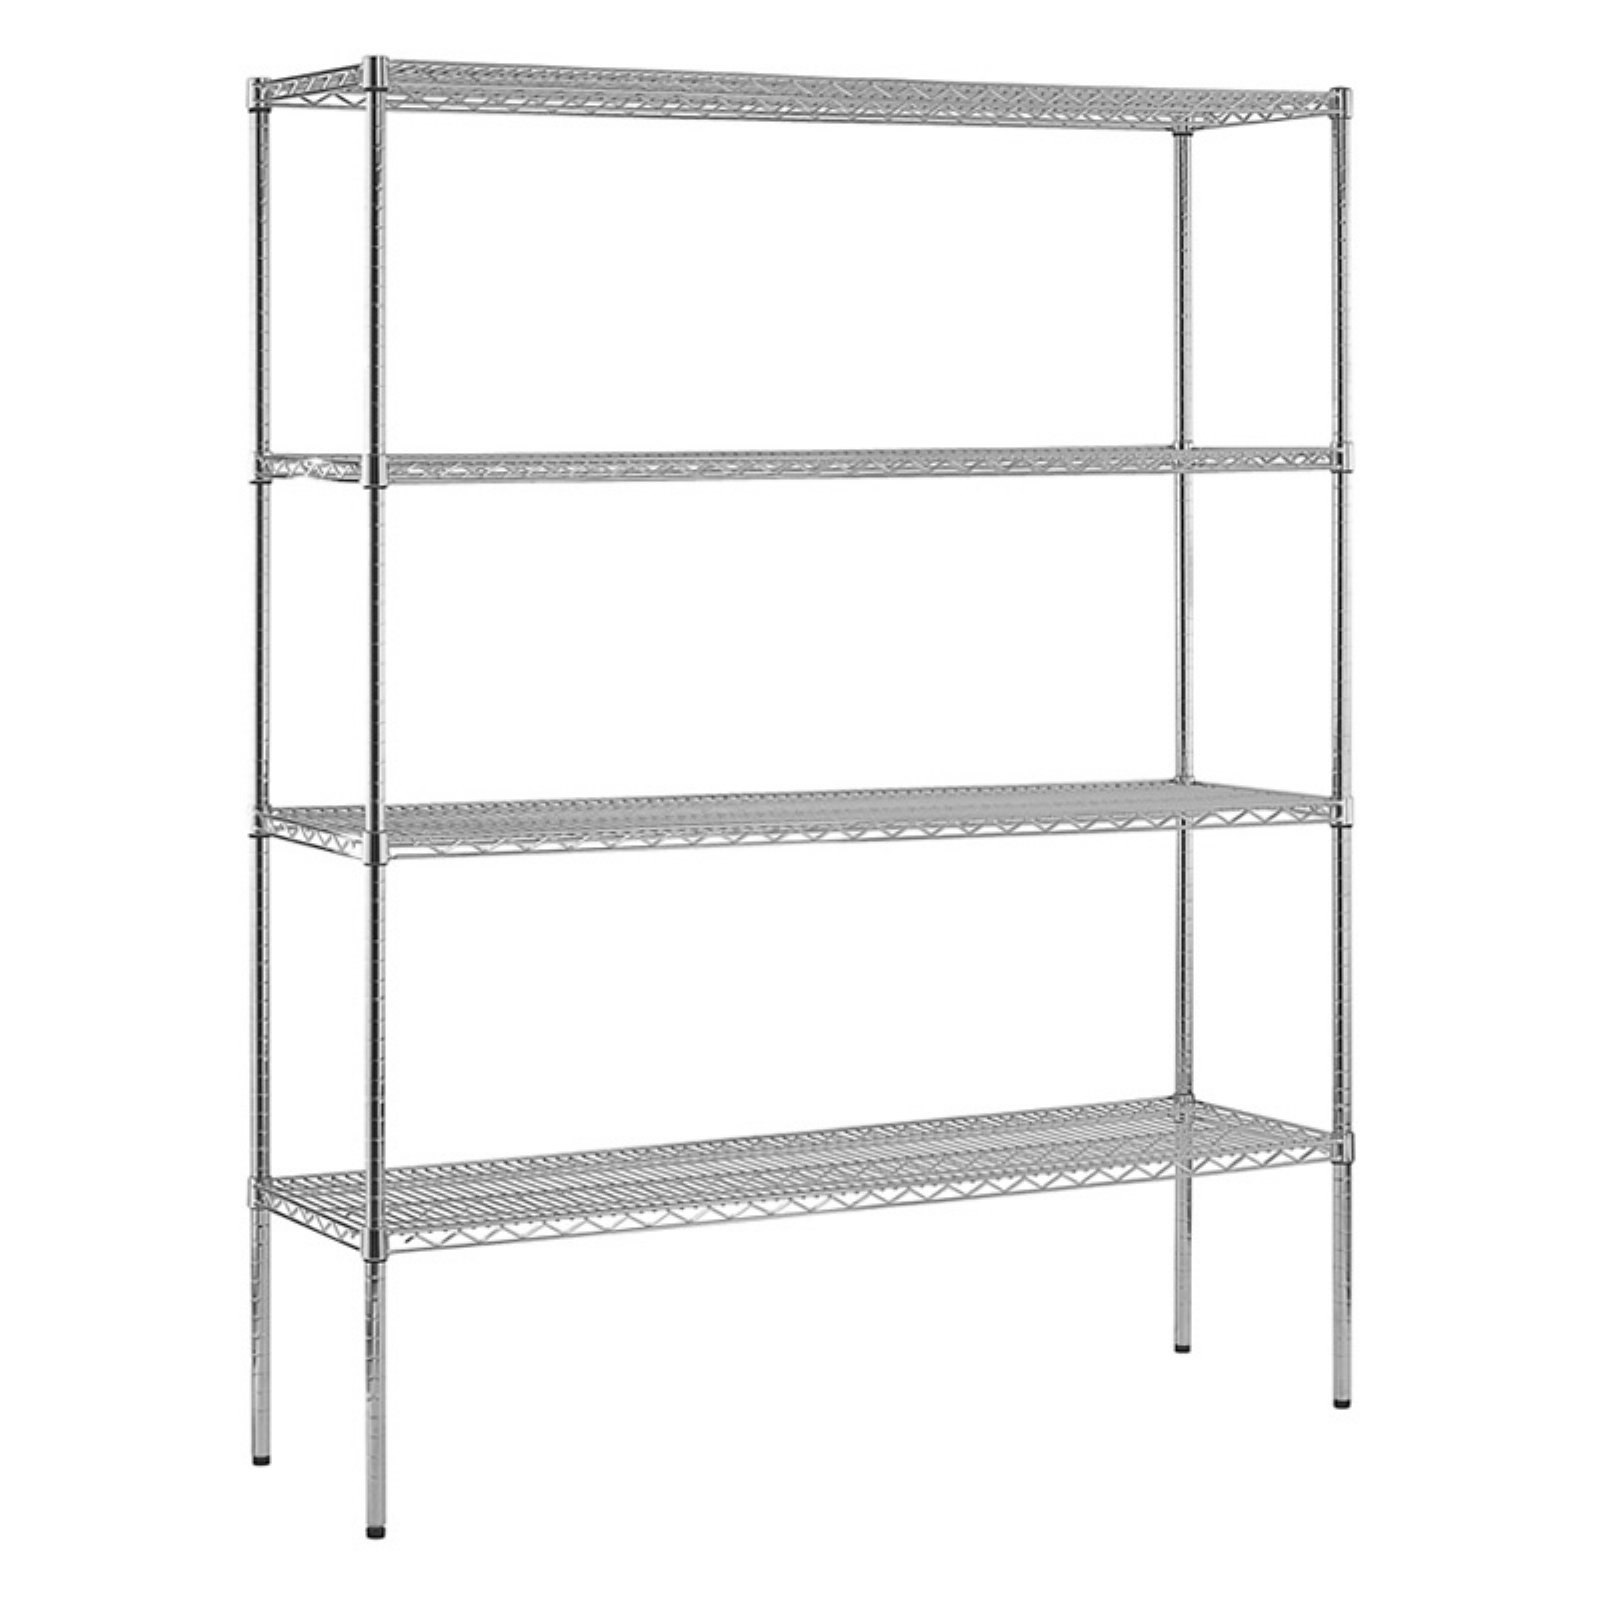 Sandusky 4-Level Wire Shelving, Chrome - Walmart.com